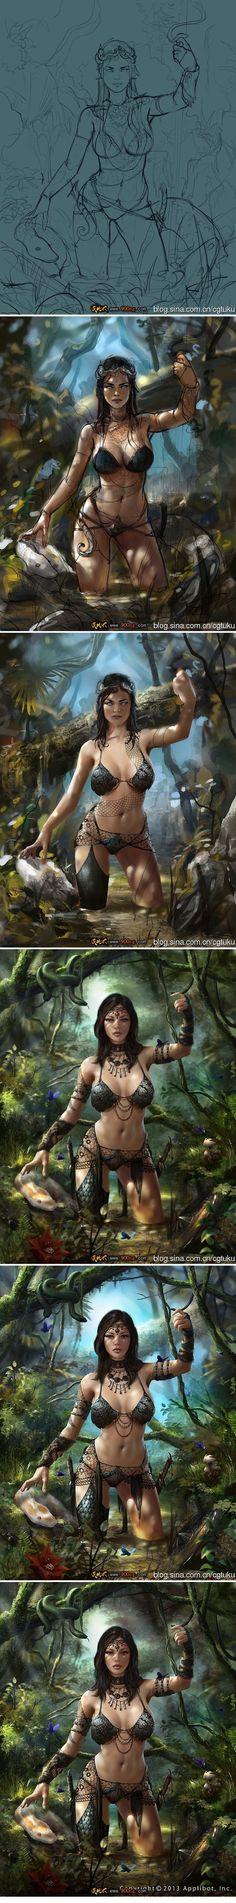 40acbc06982debf029d41ad0d2b7b1d0 - Fantasy, RPG image hosting